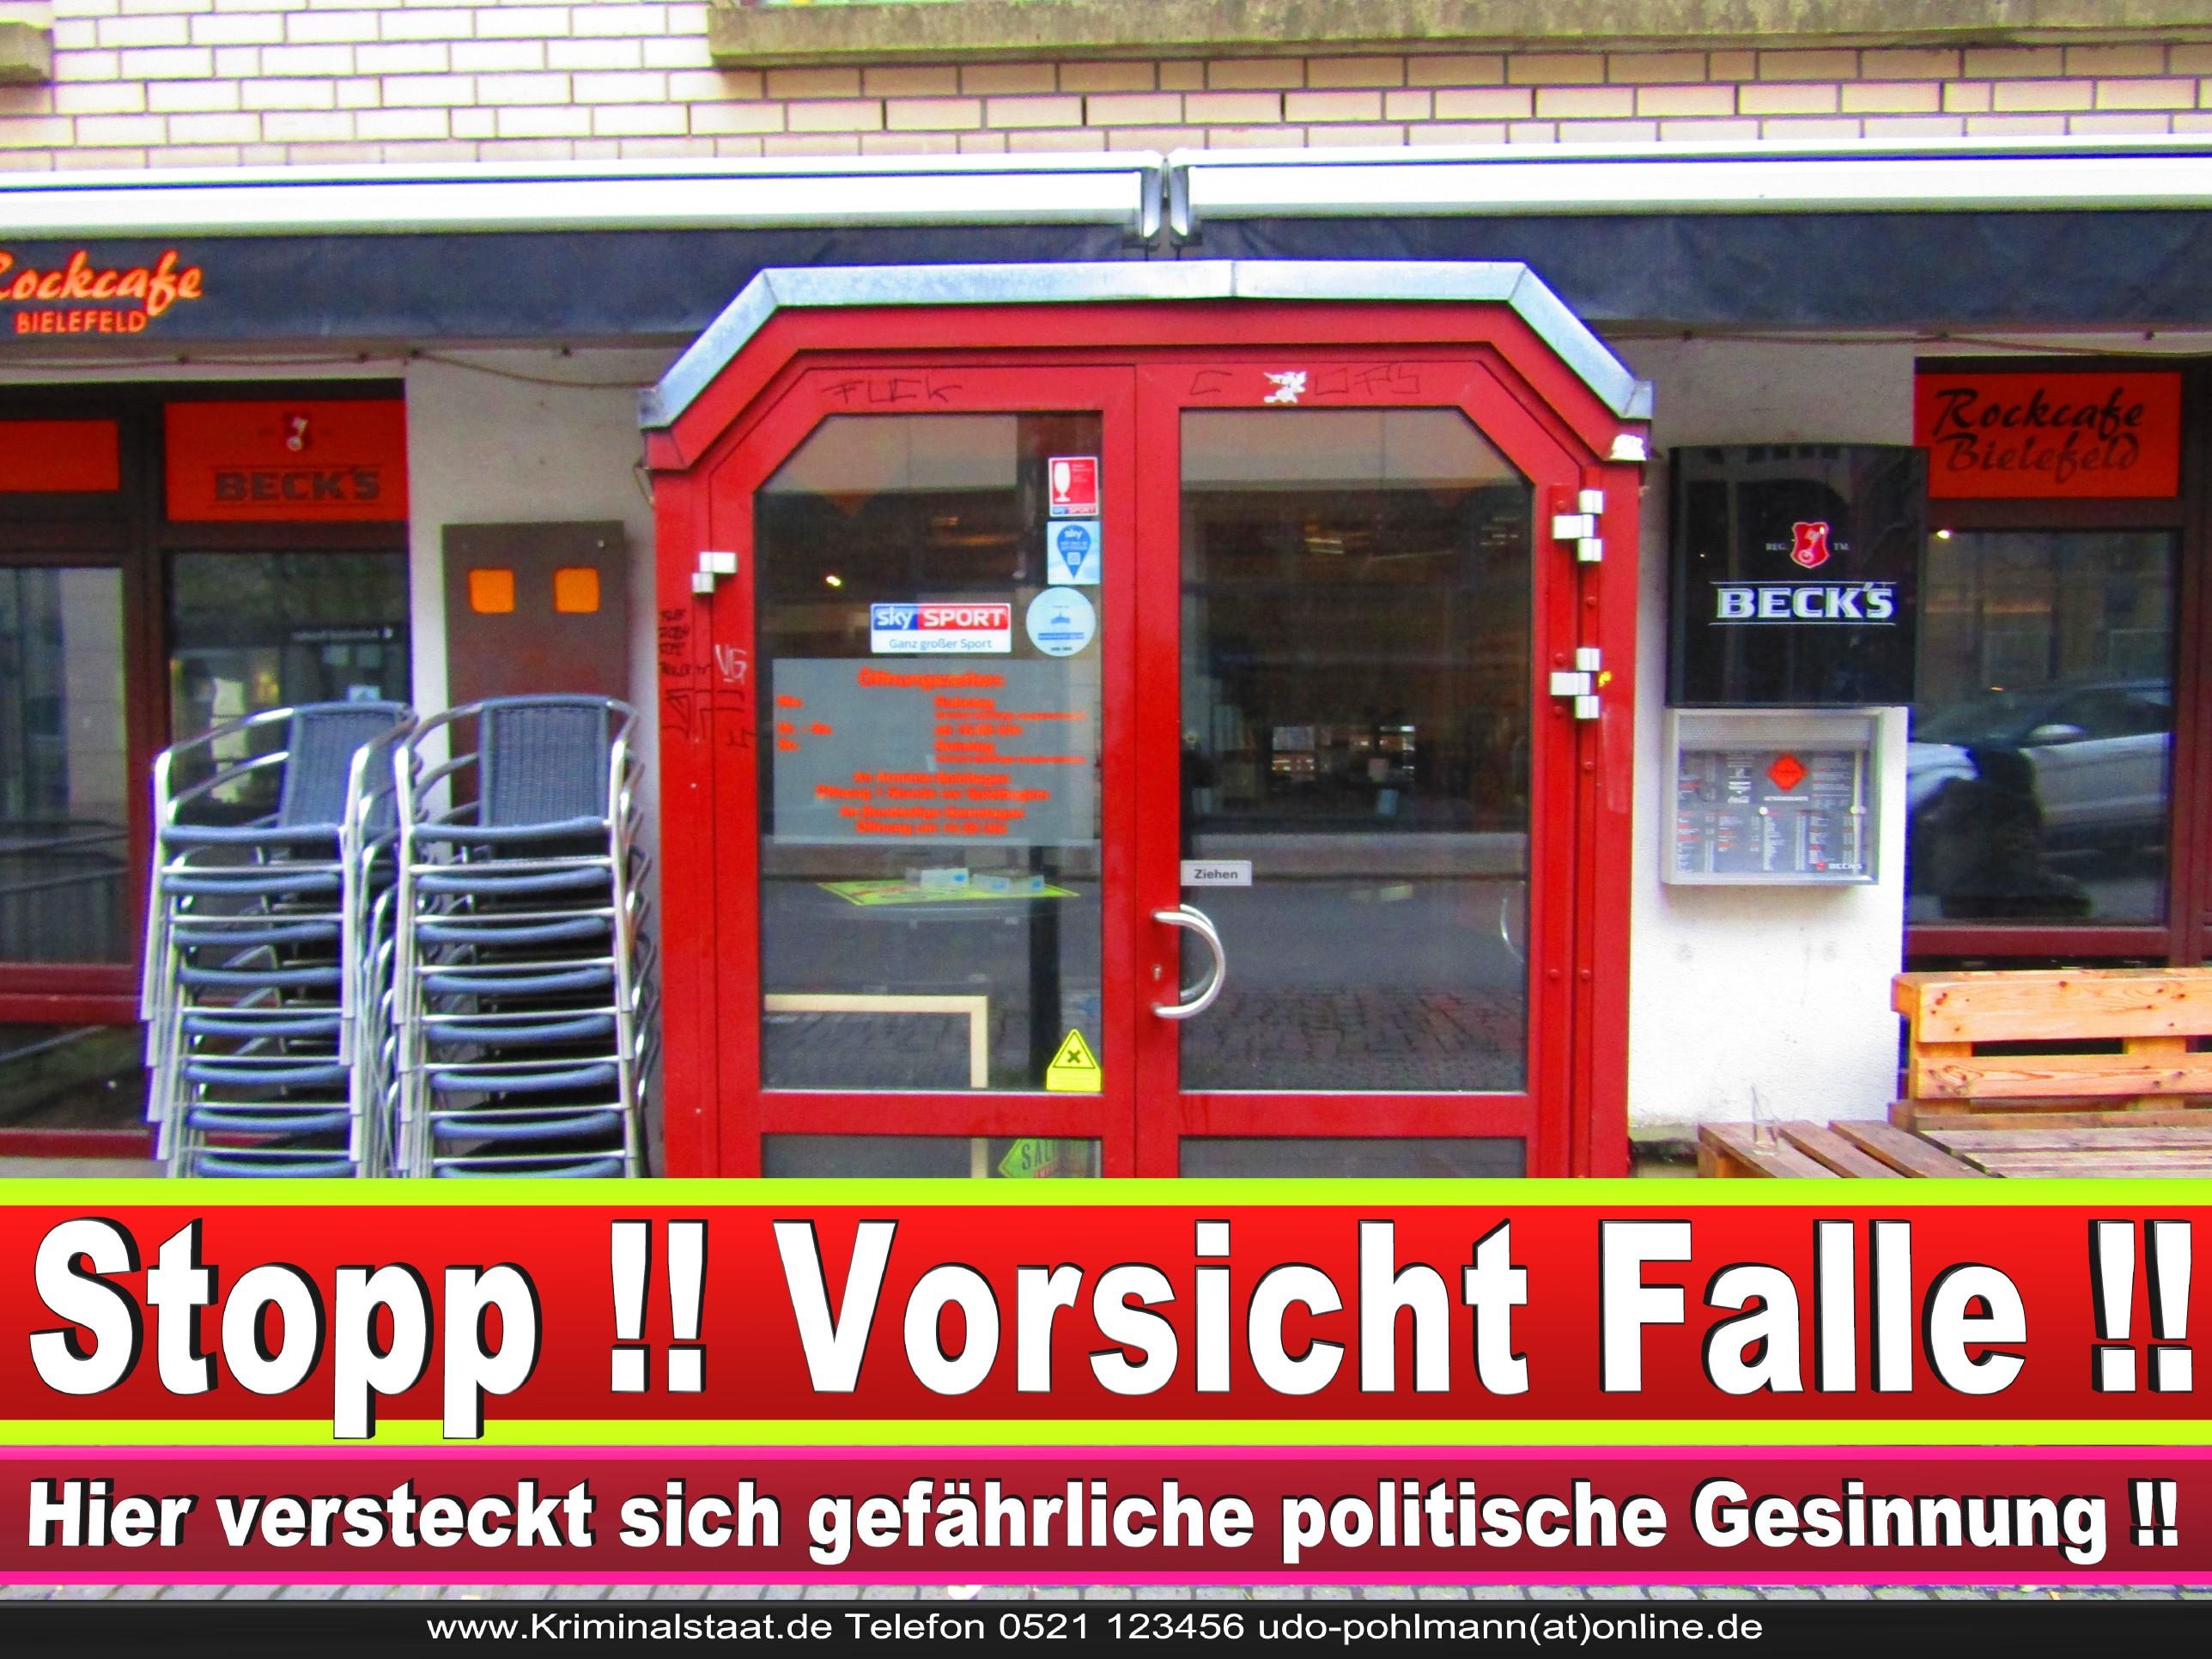 Rockcafe Bielefeld Neustädter Str 25 33602 CDU Bielefeld NRW 5